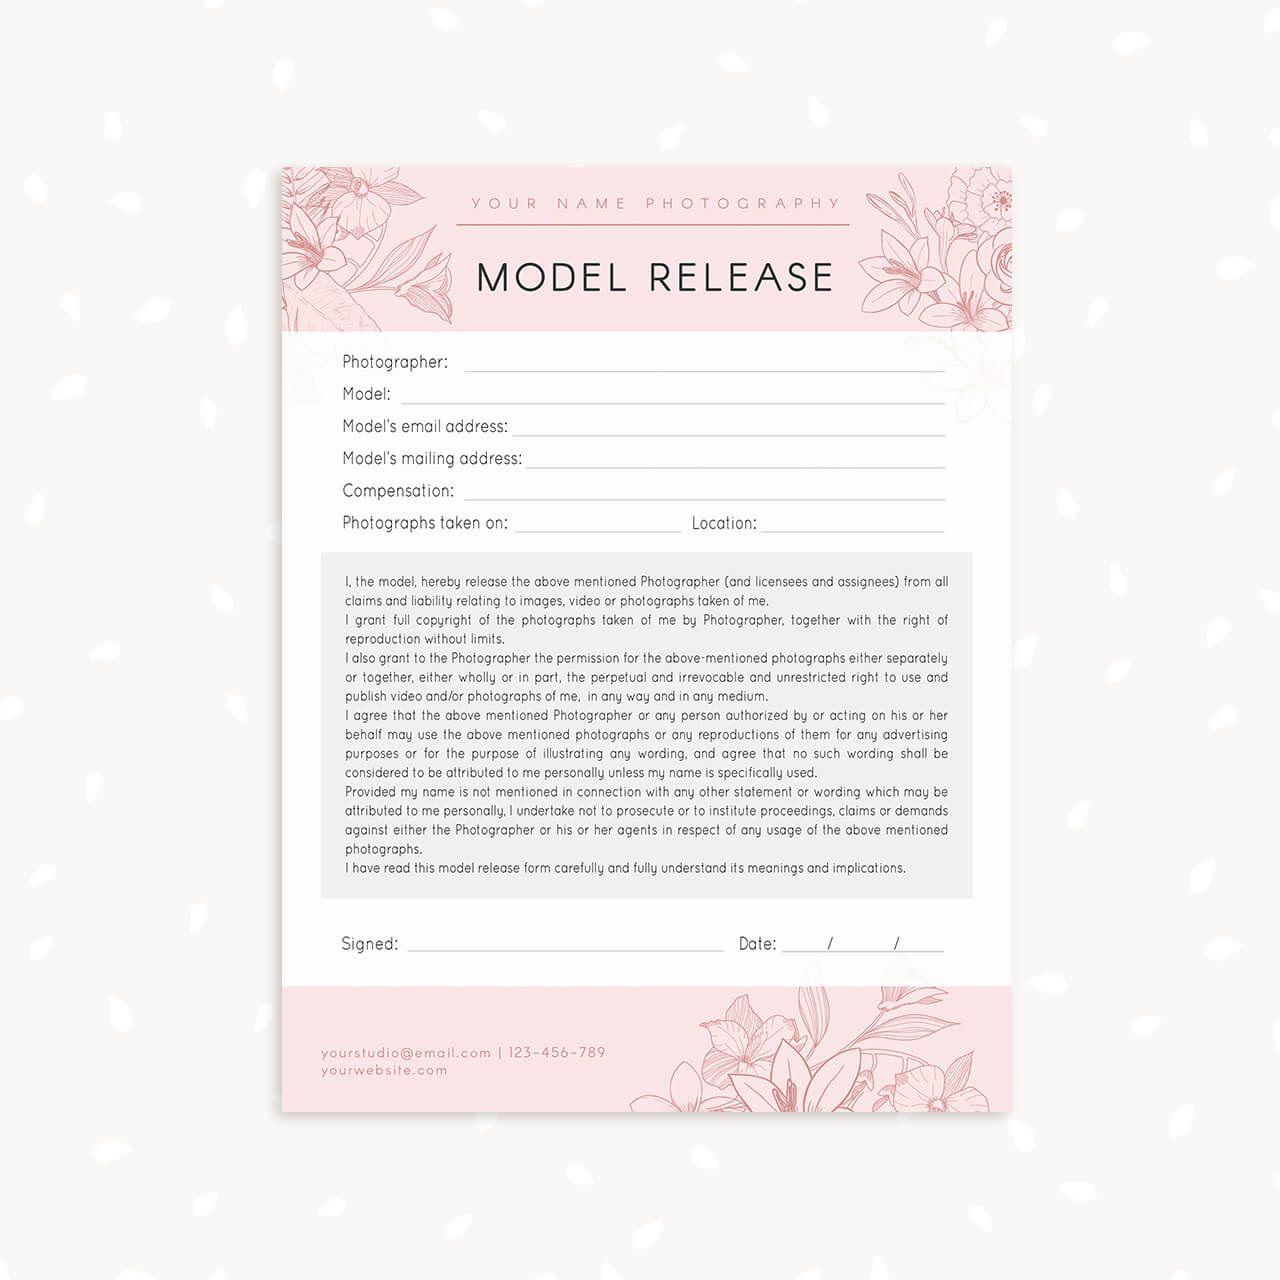 006 Marvelou Model Release Form Template Highest Clarity  Photography Uk Gdpr AustraliaFull